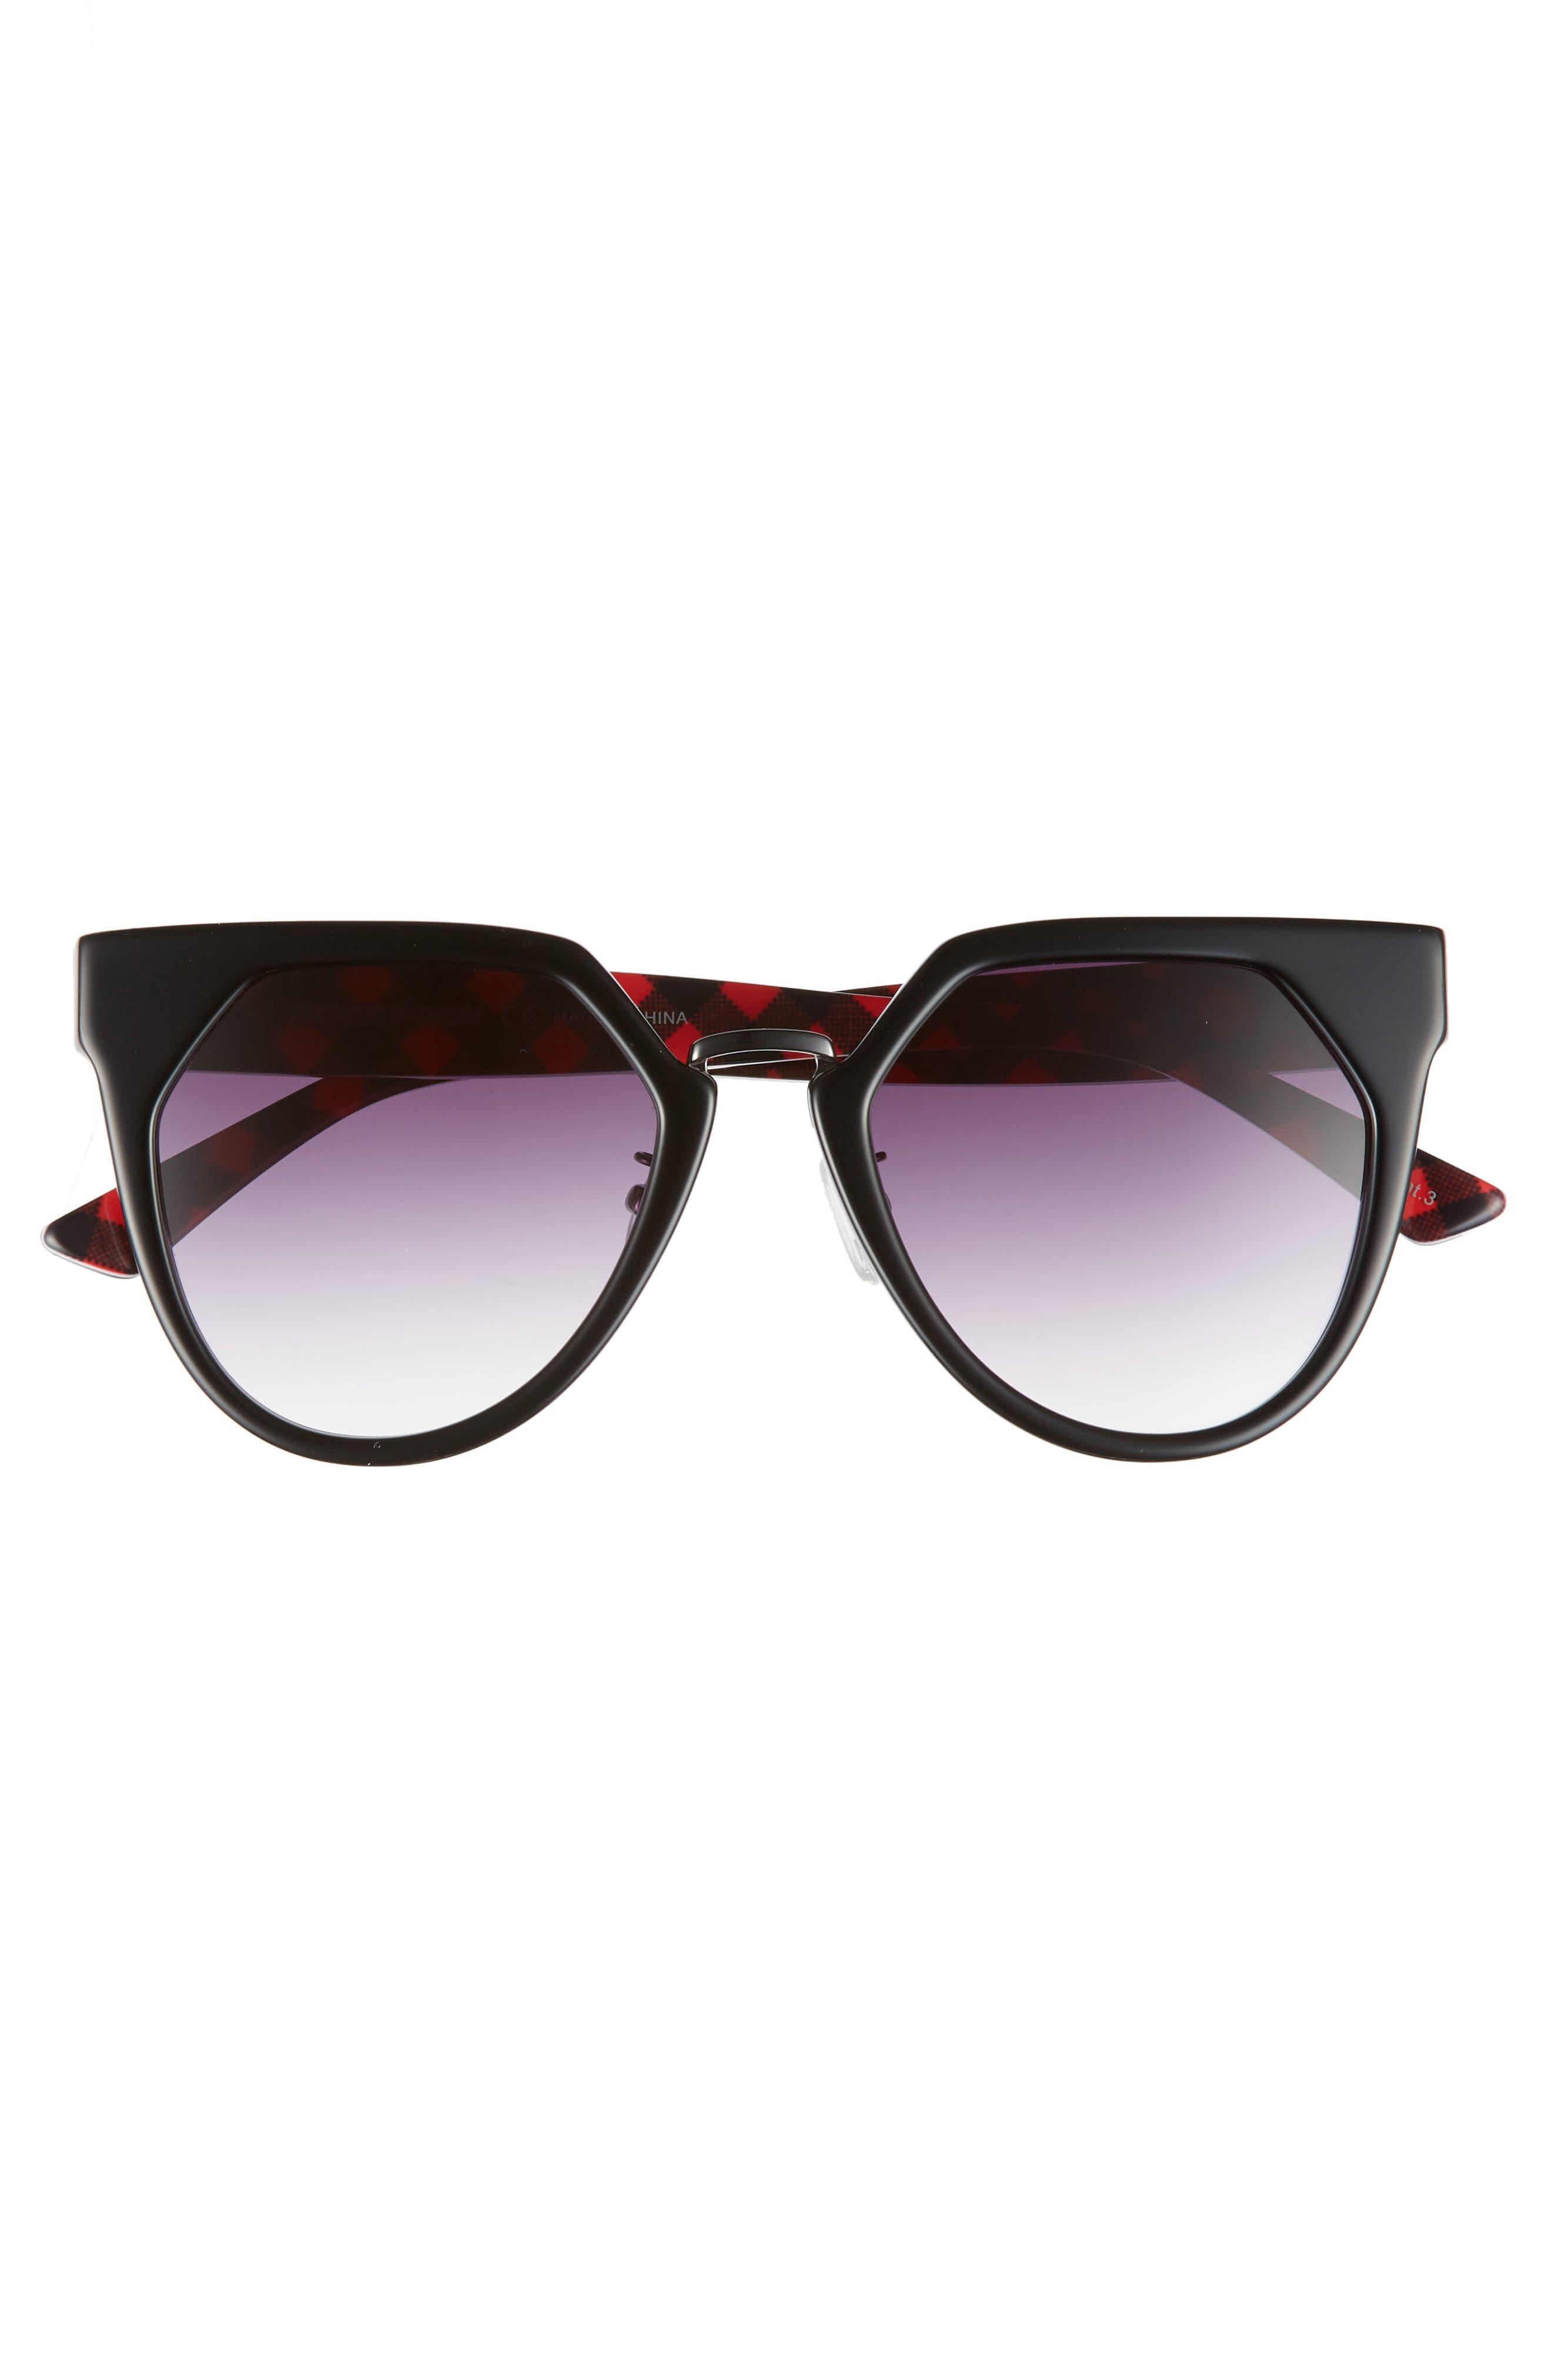 53mm Cat Eye Sunglasses,                             Alternate thumbnail 5, color,